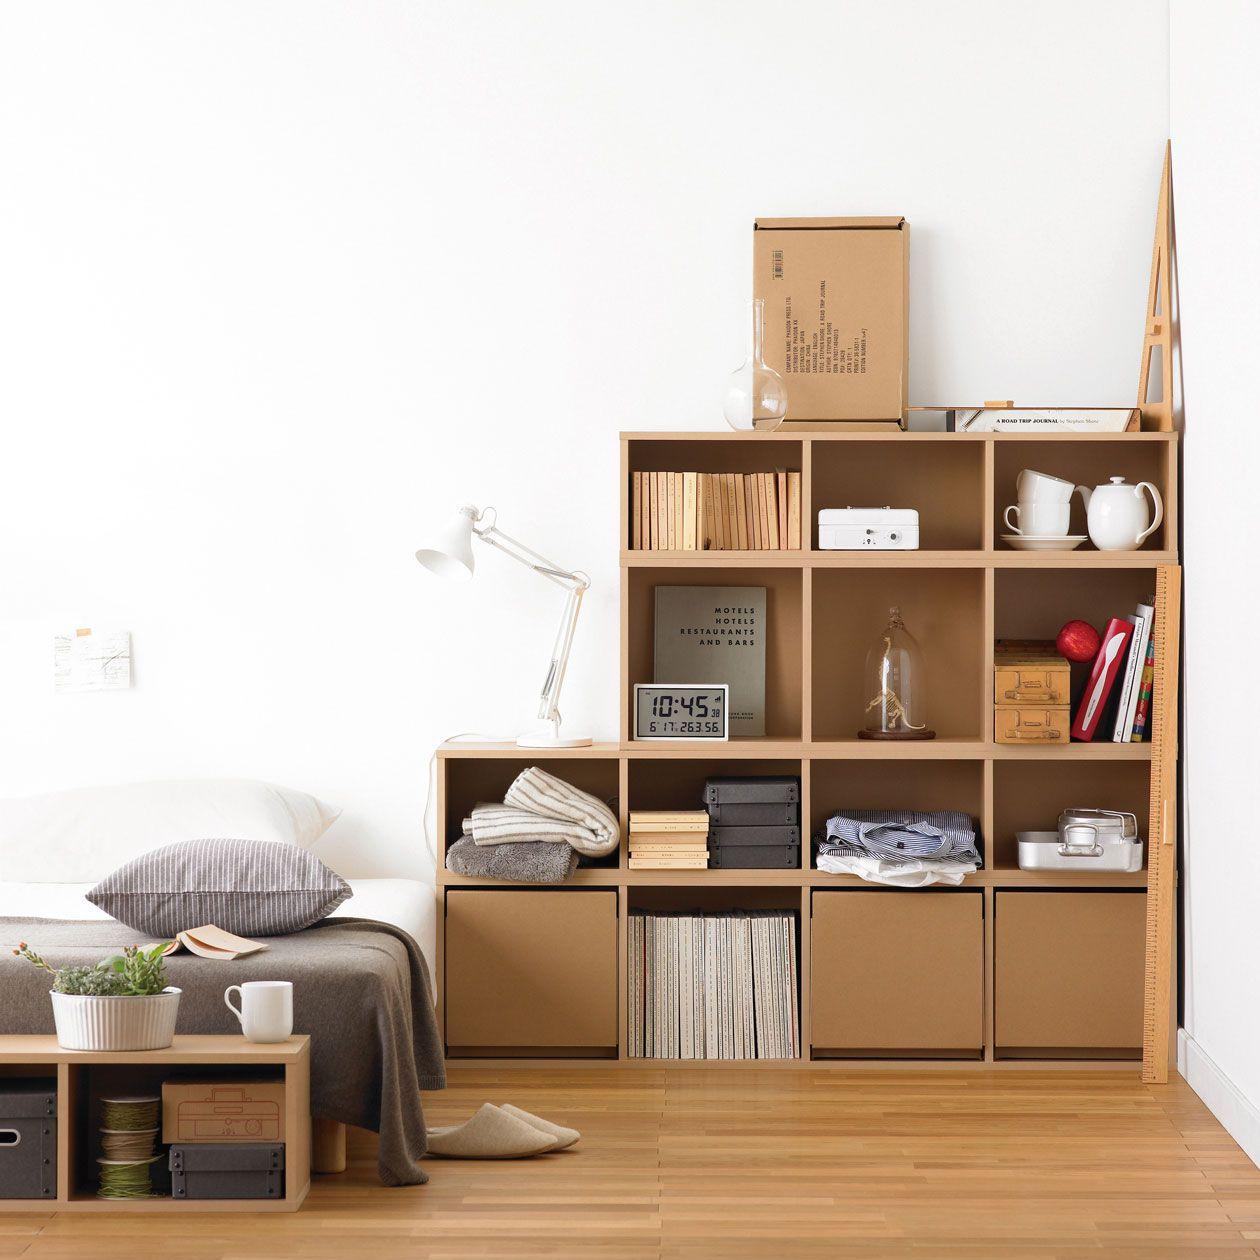 muji online bienvenue sur le site de vente en ligne muji deco pinterest muji furniture. Black Bedroom Furniture Sets. Home Design Ideas